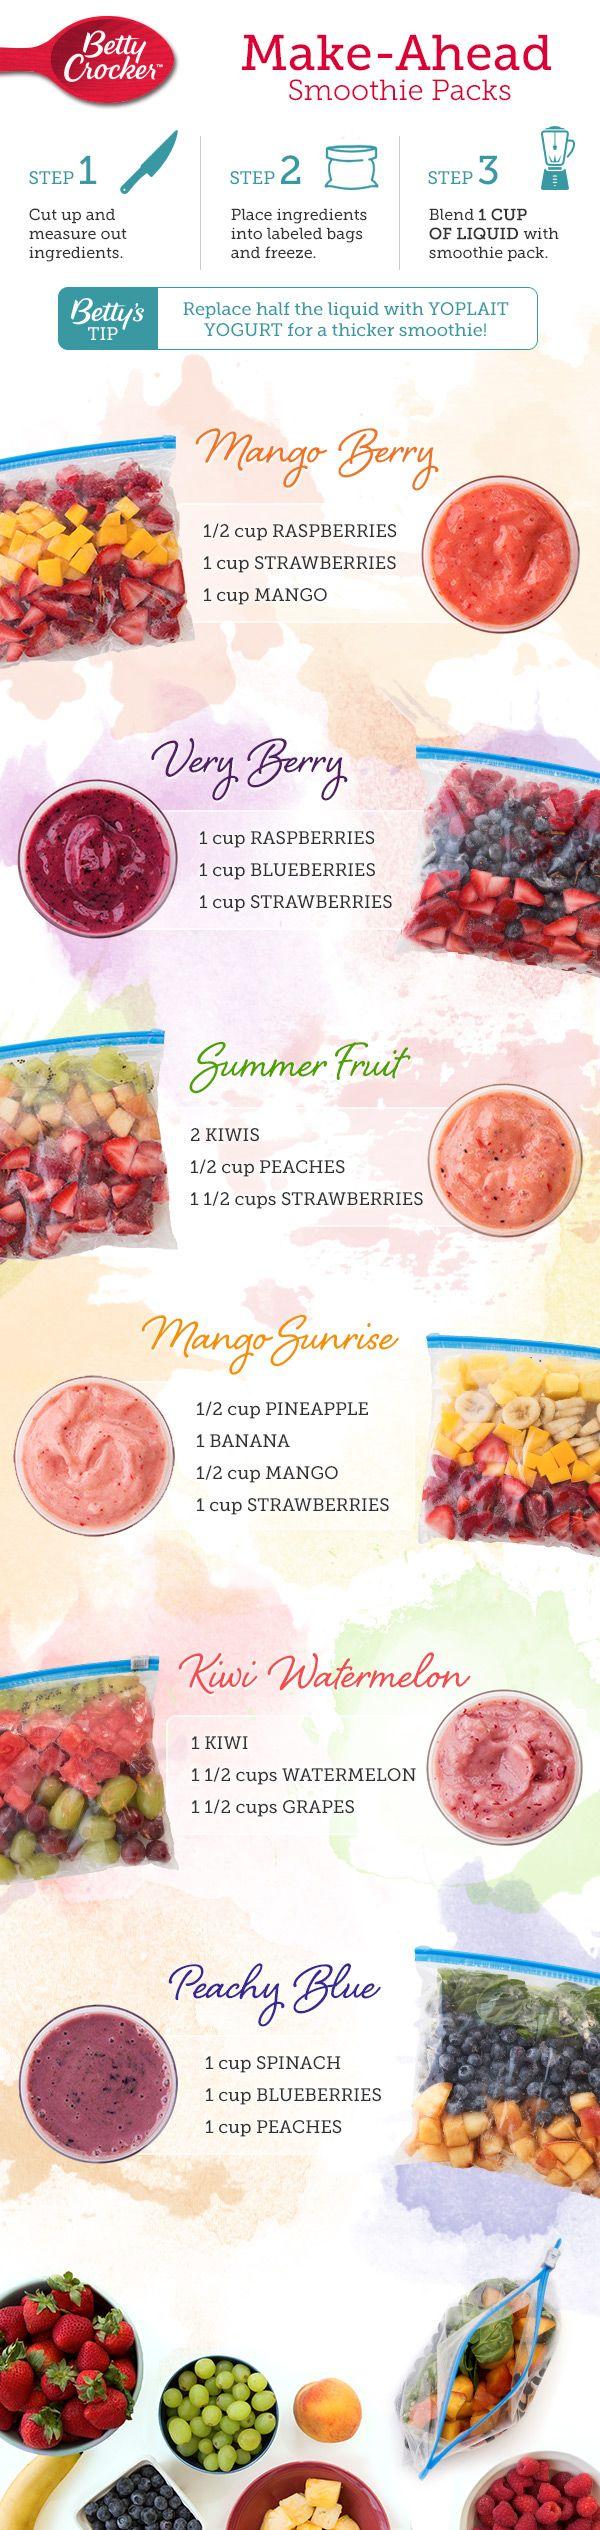 6 make-ahead smoothie packs                                                                                                                                                                                 More